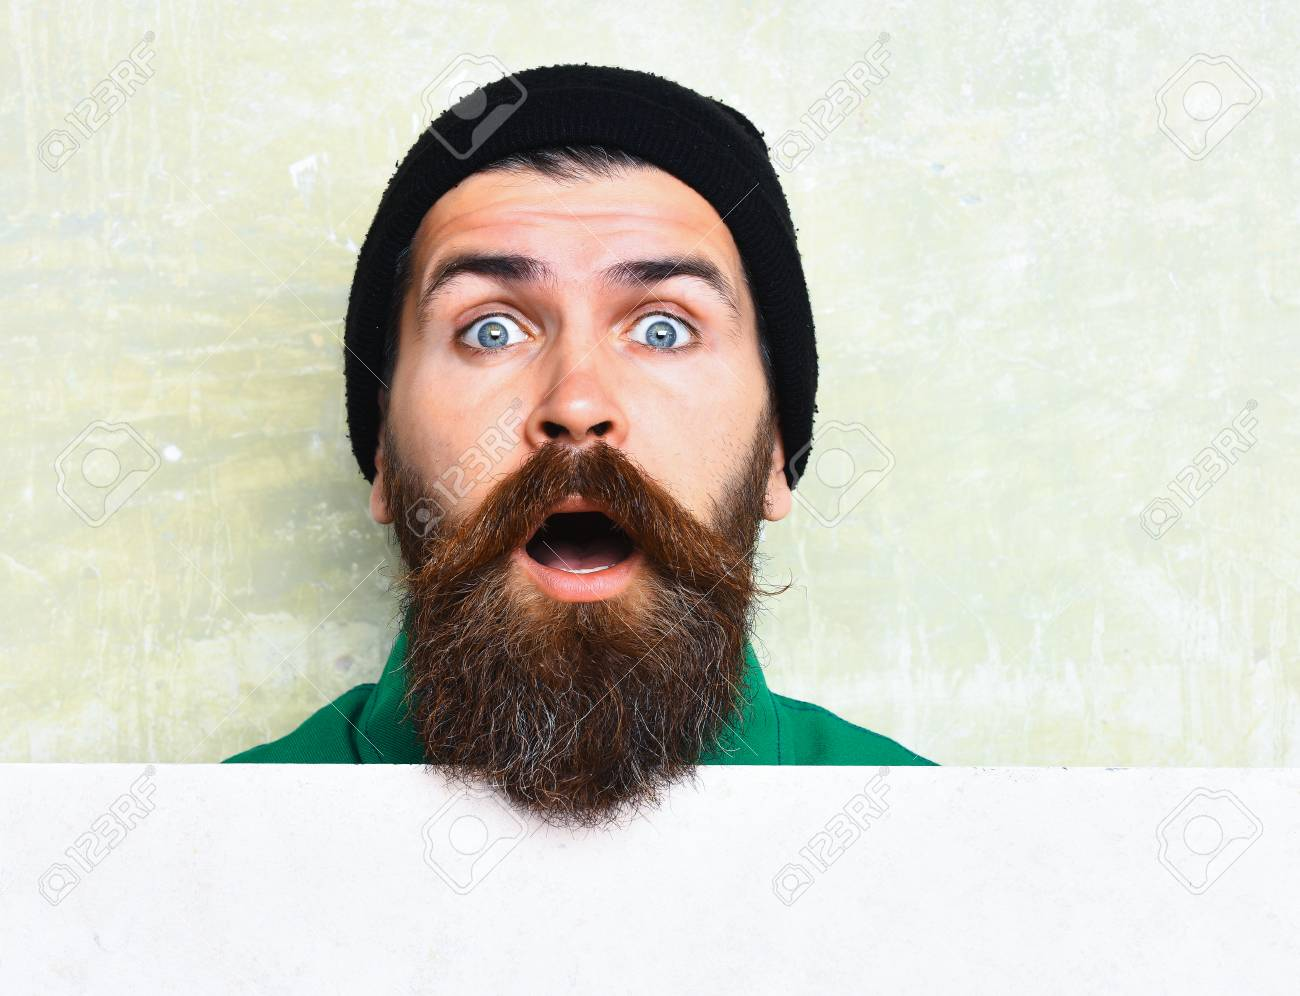 65abb76c79c Bearded Man In Black Cap